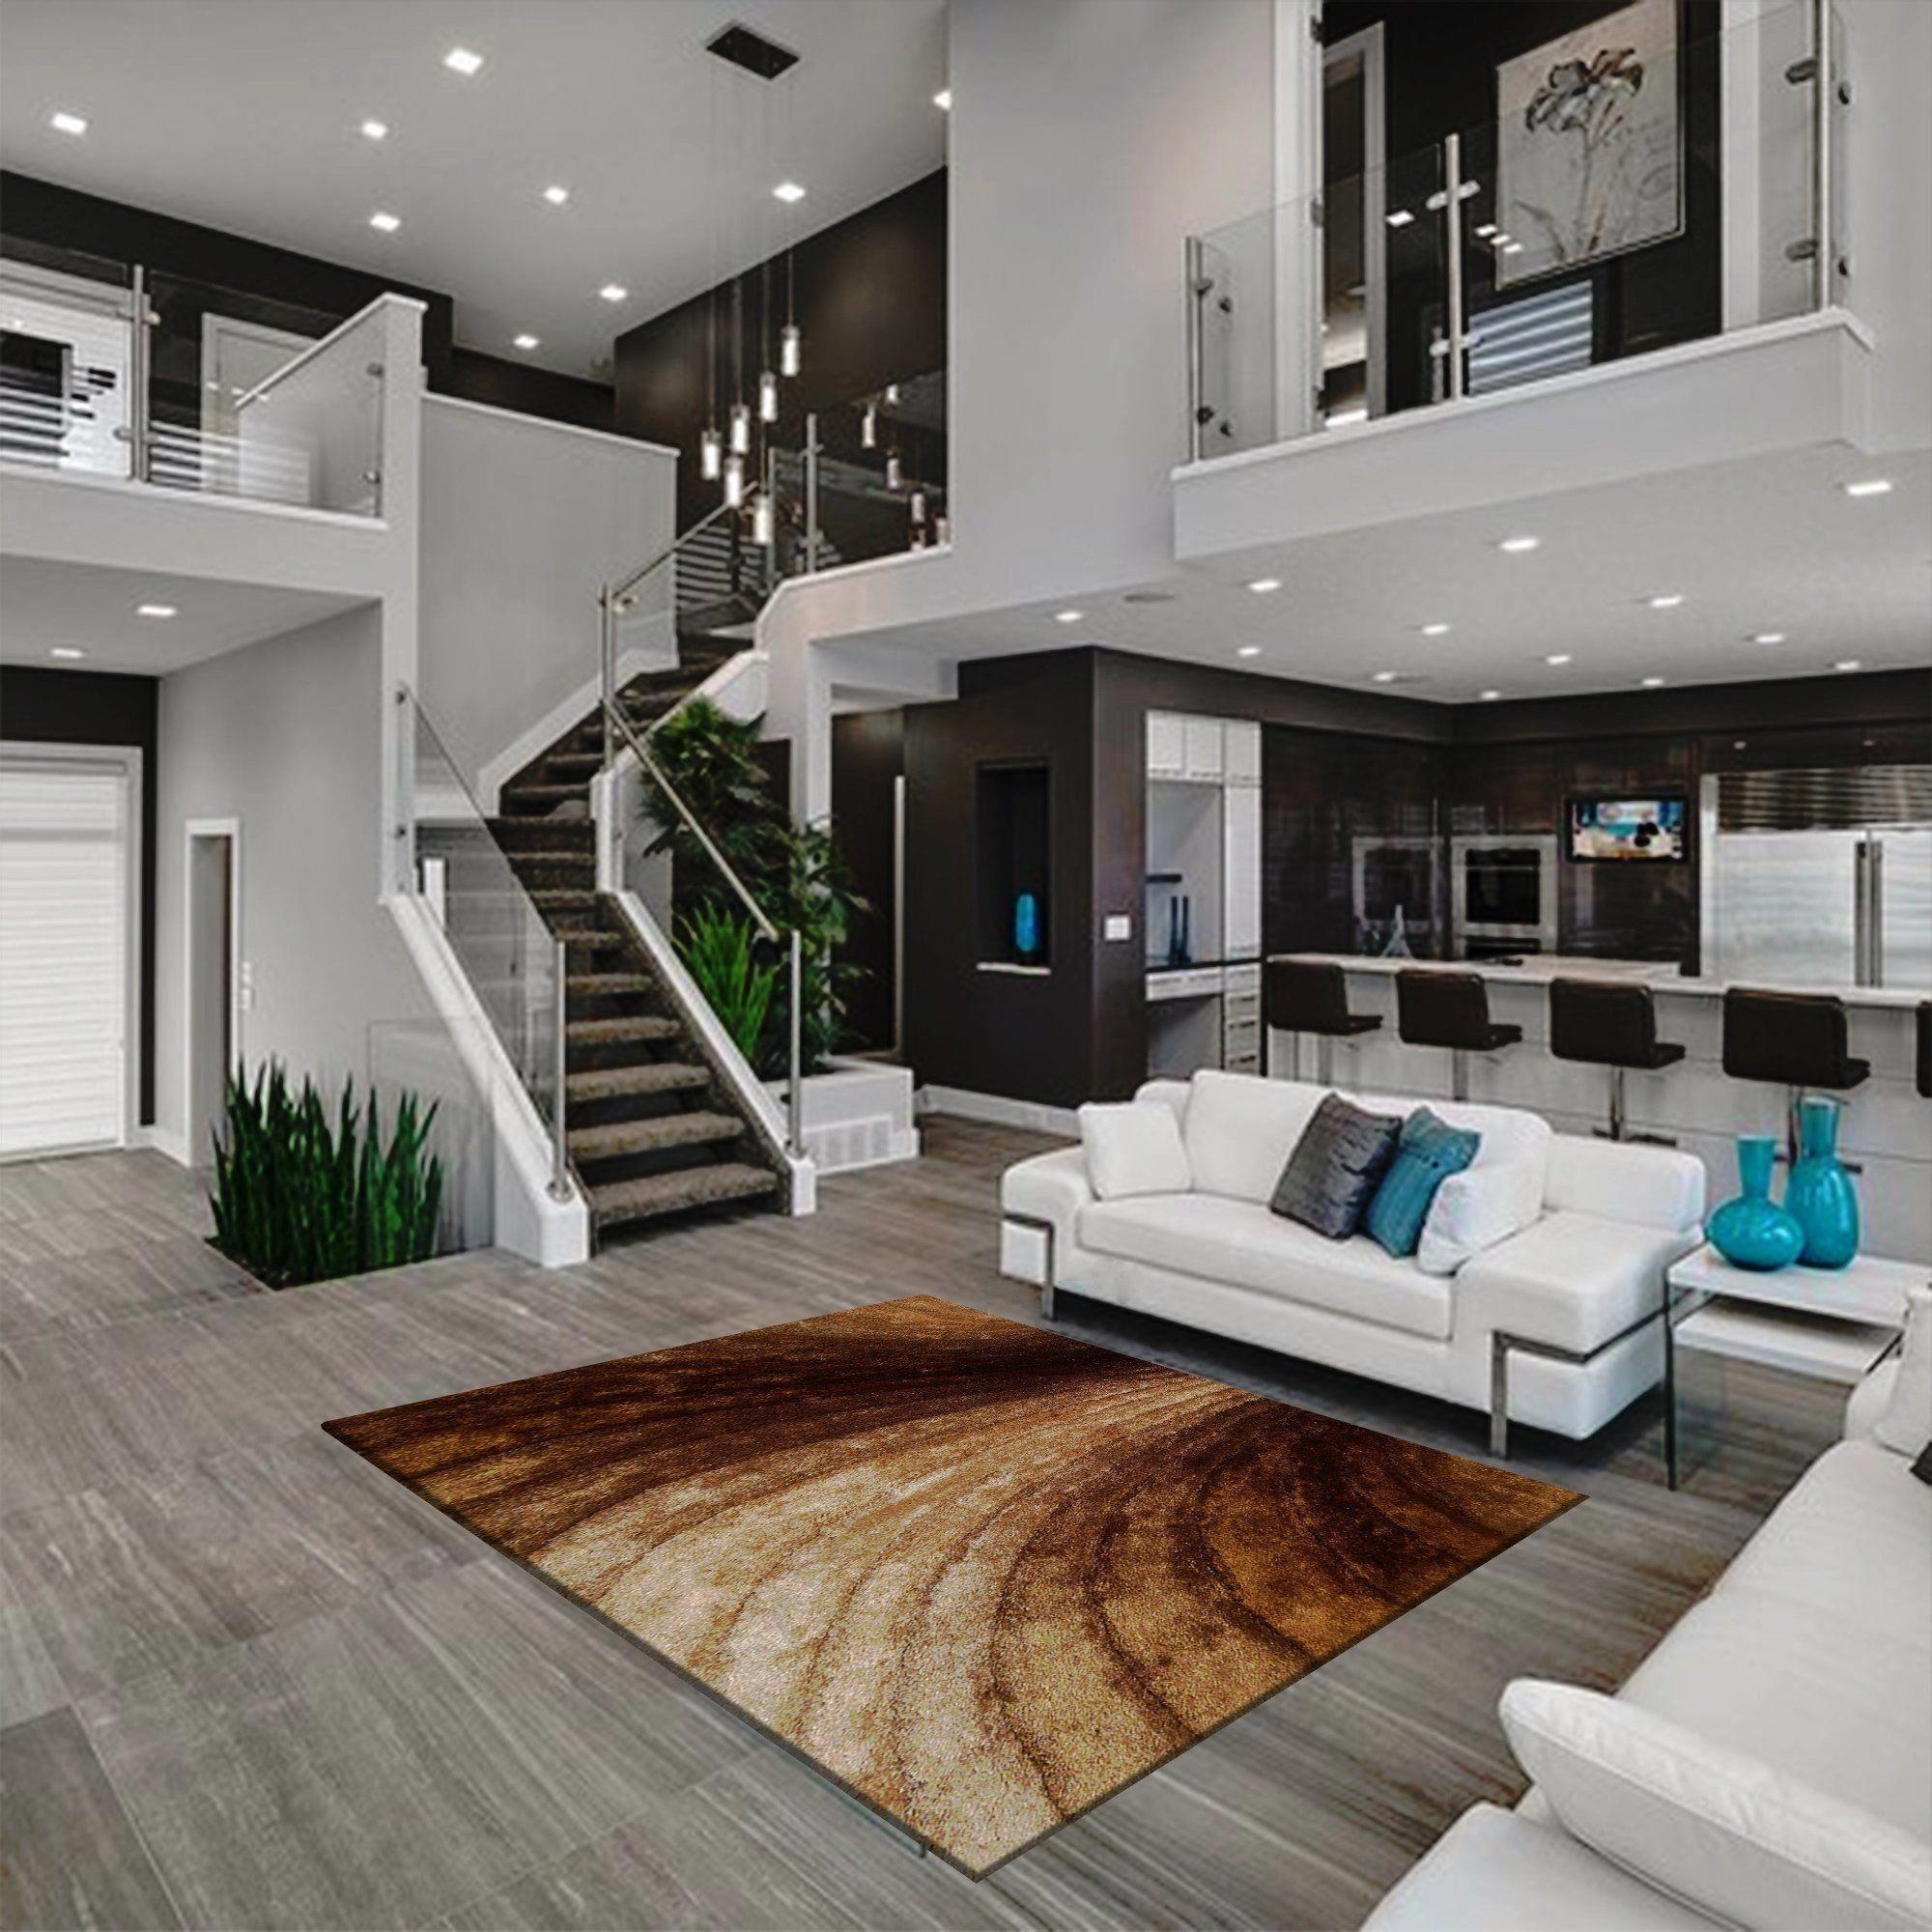 Contemporary Basement Design: Remodel Basement,basement Ideas,renovate Basement,basement